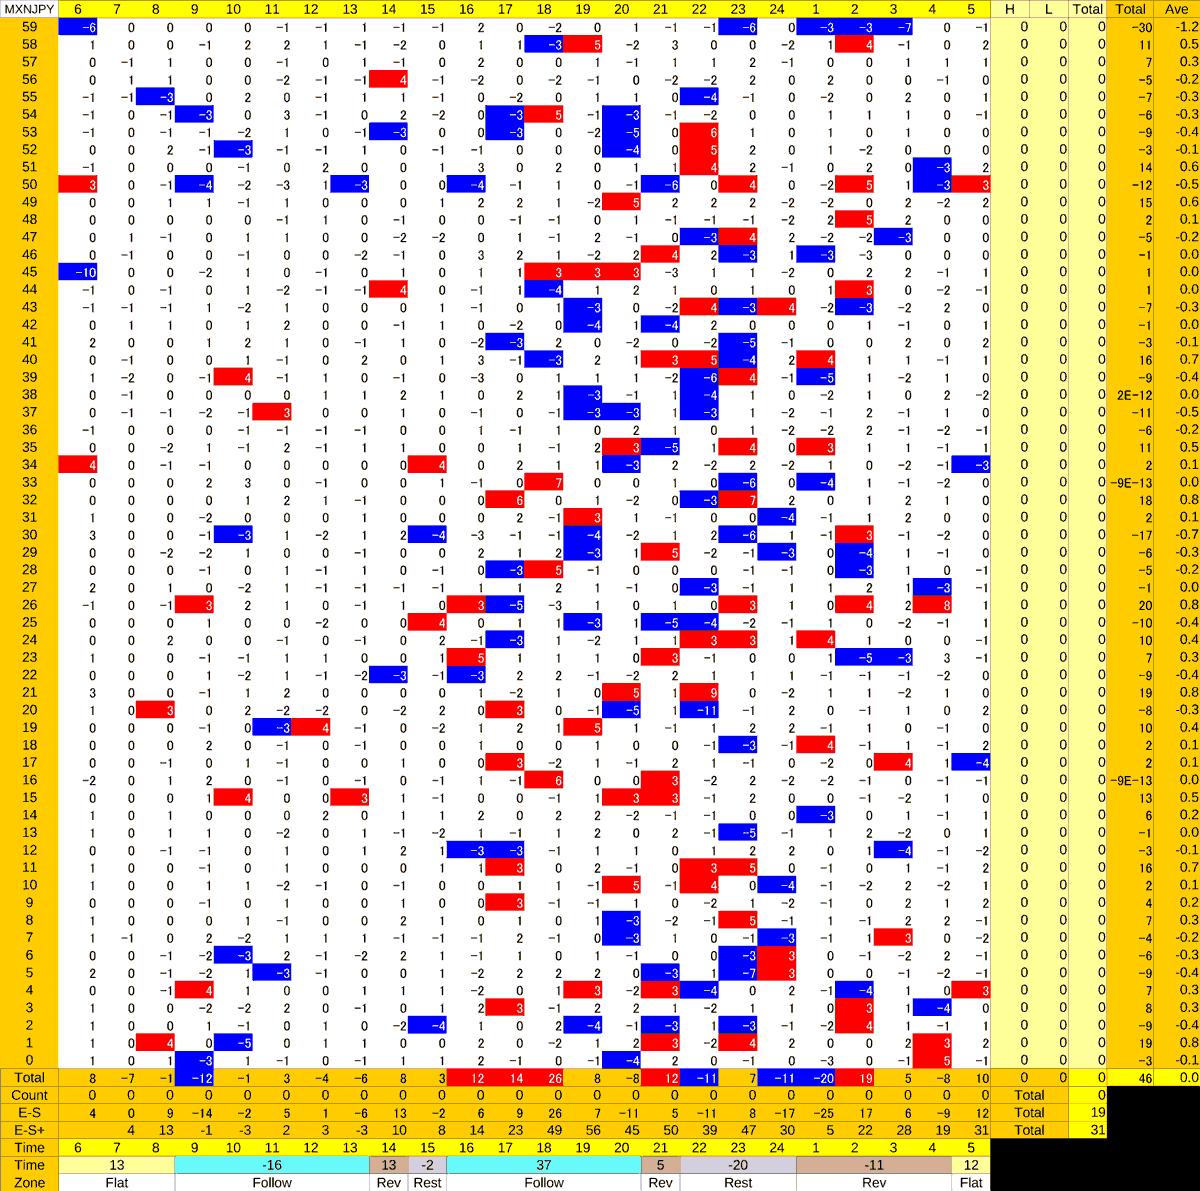 20201105_HS(3)MXNJPY